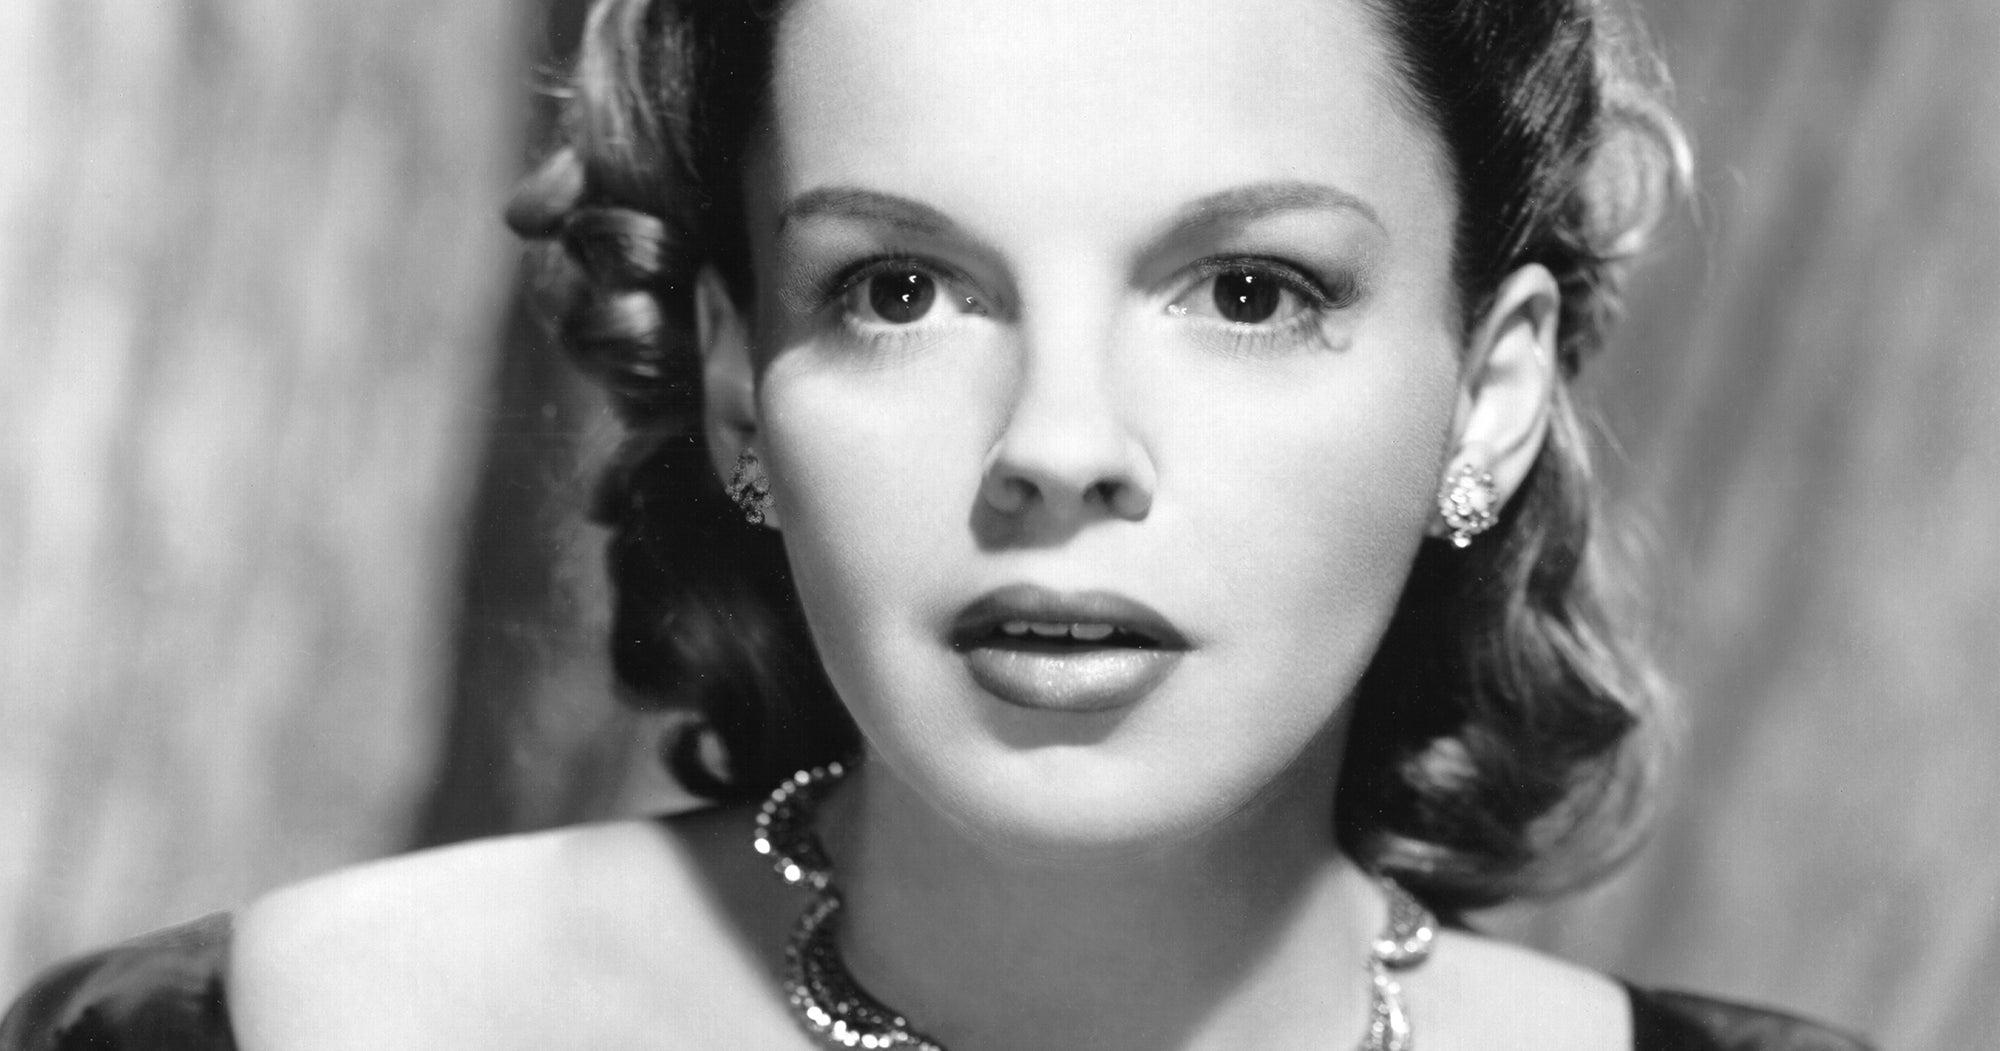 What Made Judy Garland's Life So Tragic